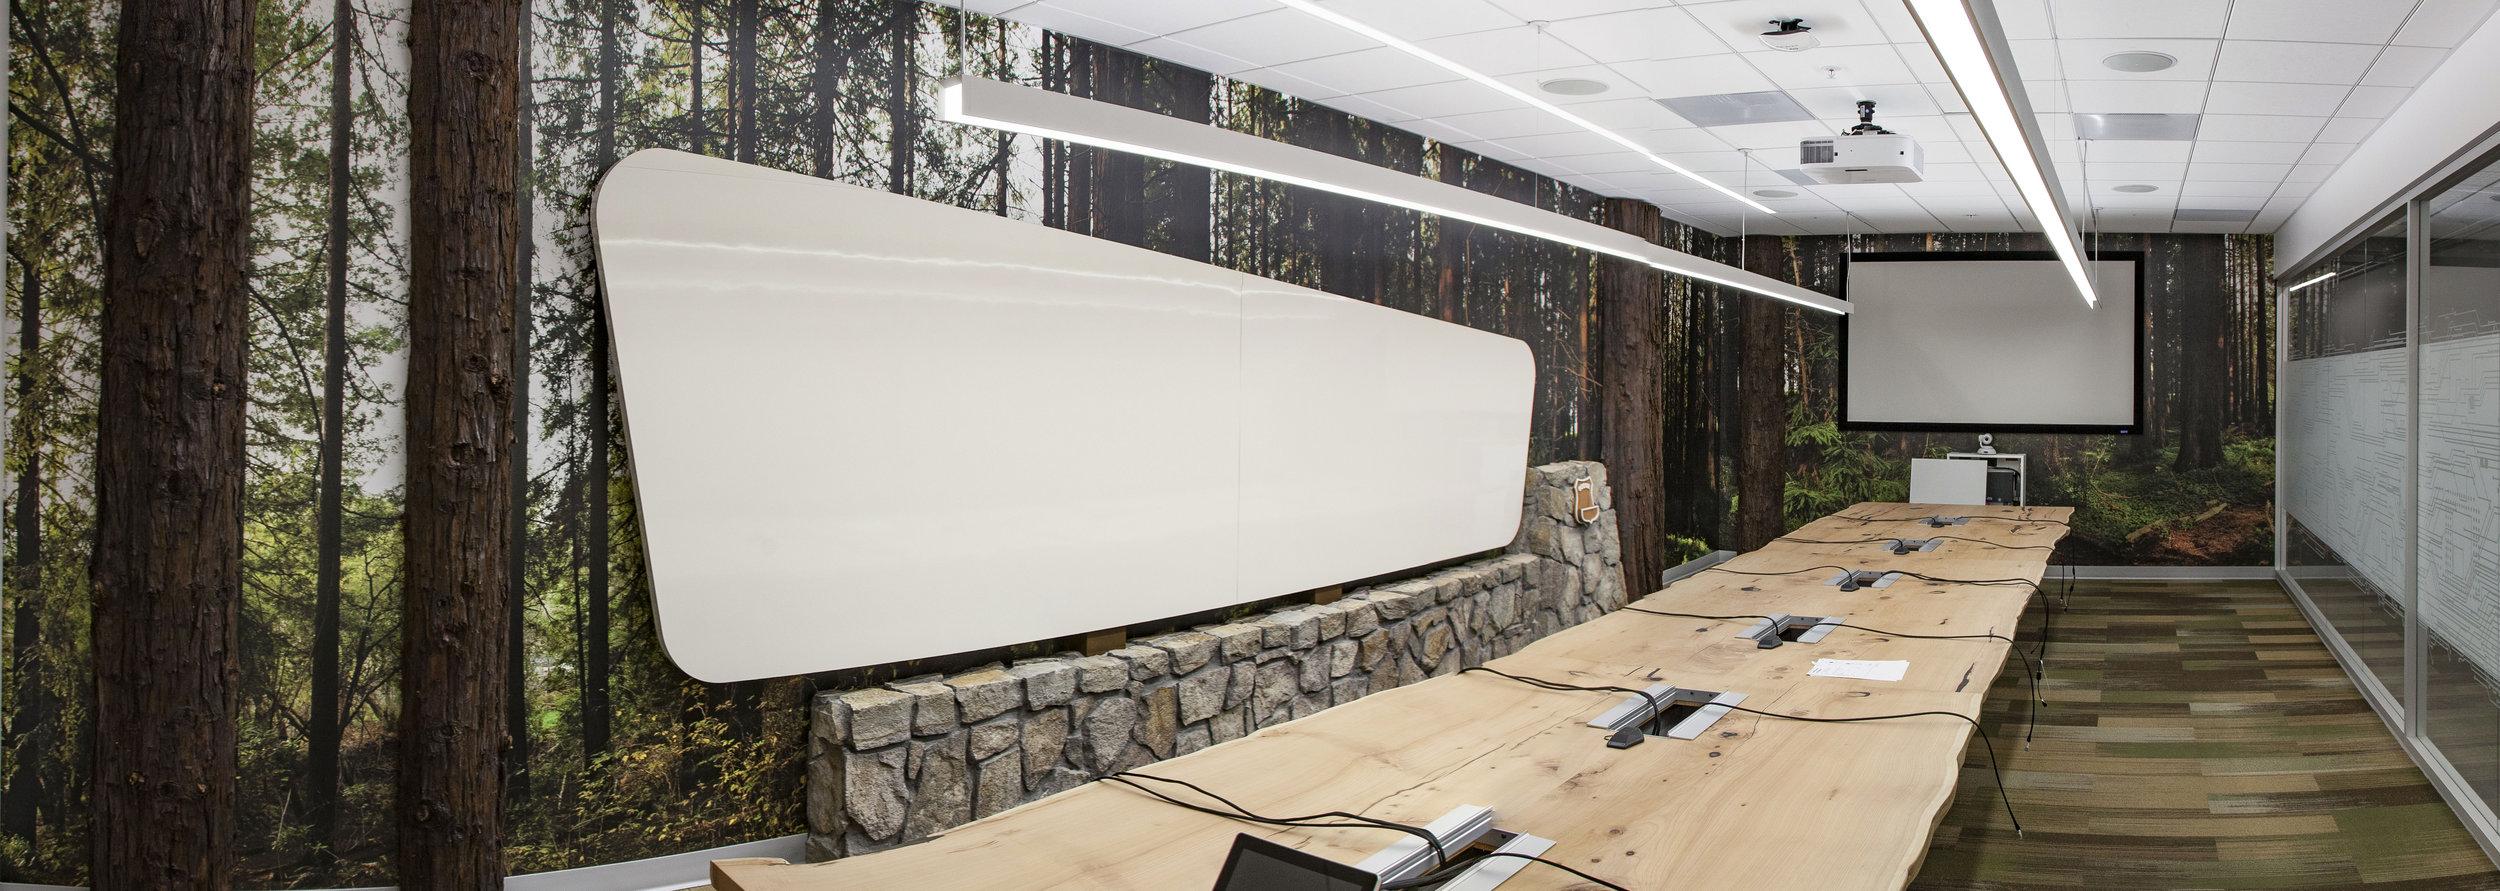 redwood_panorama_2.jpg